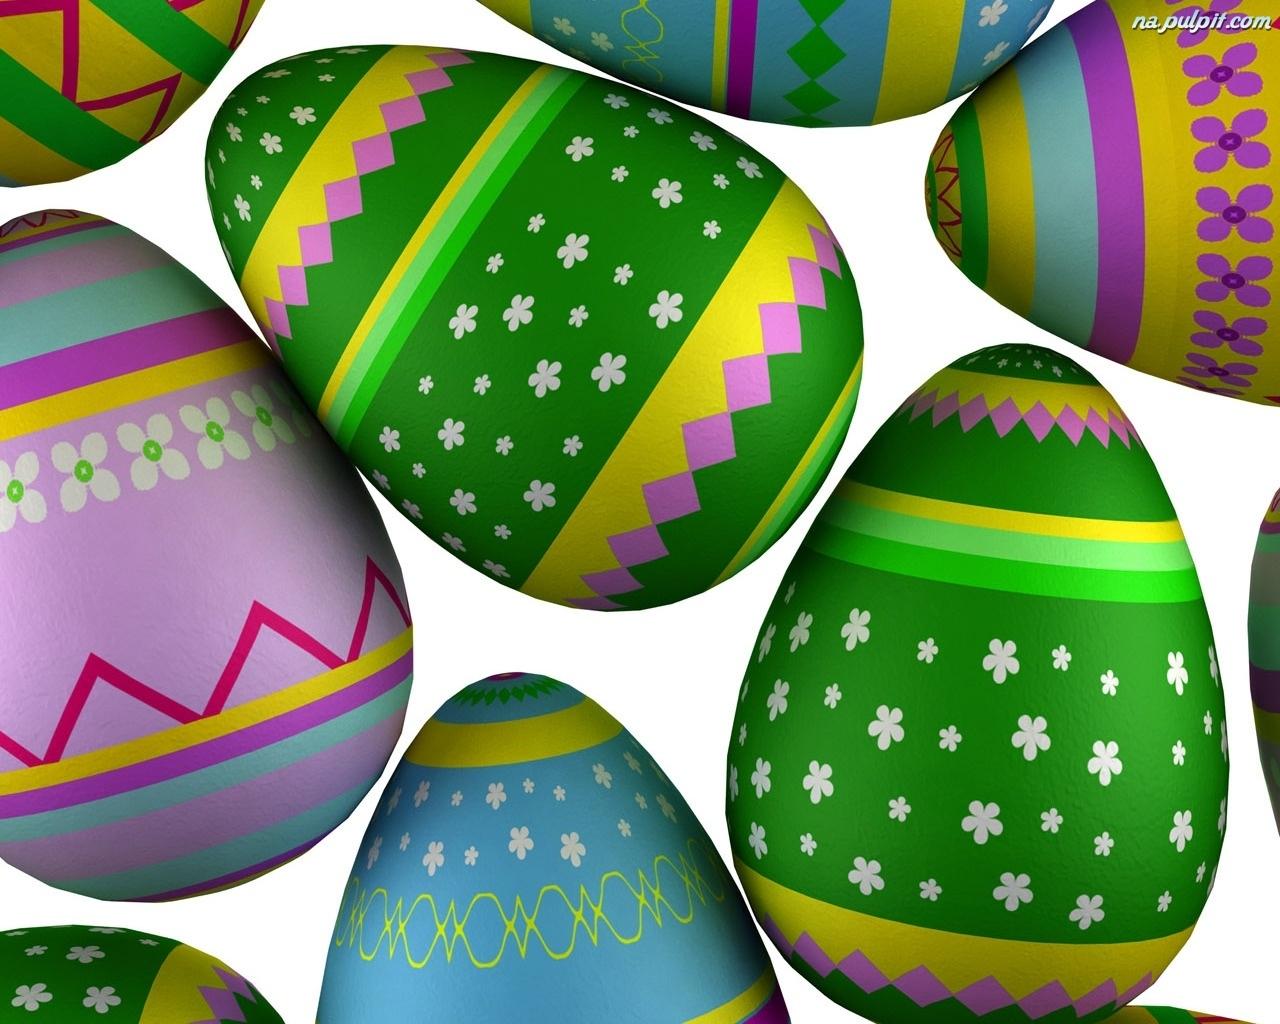 Wielkanocne jajka pictures to pin on pinterest